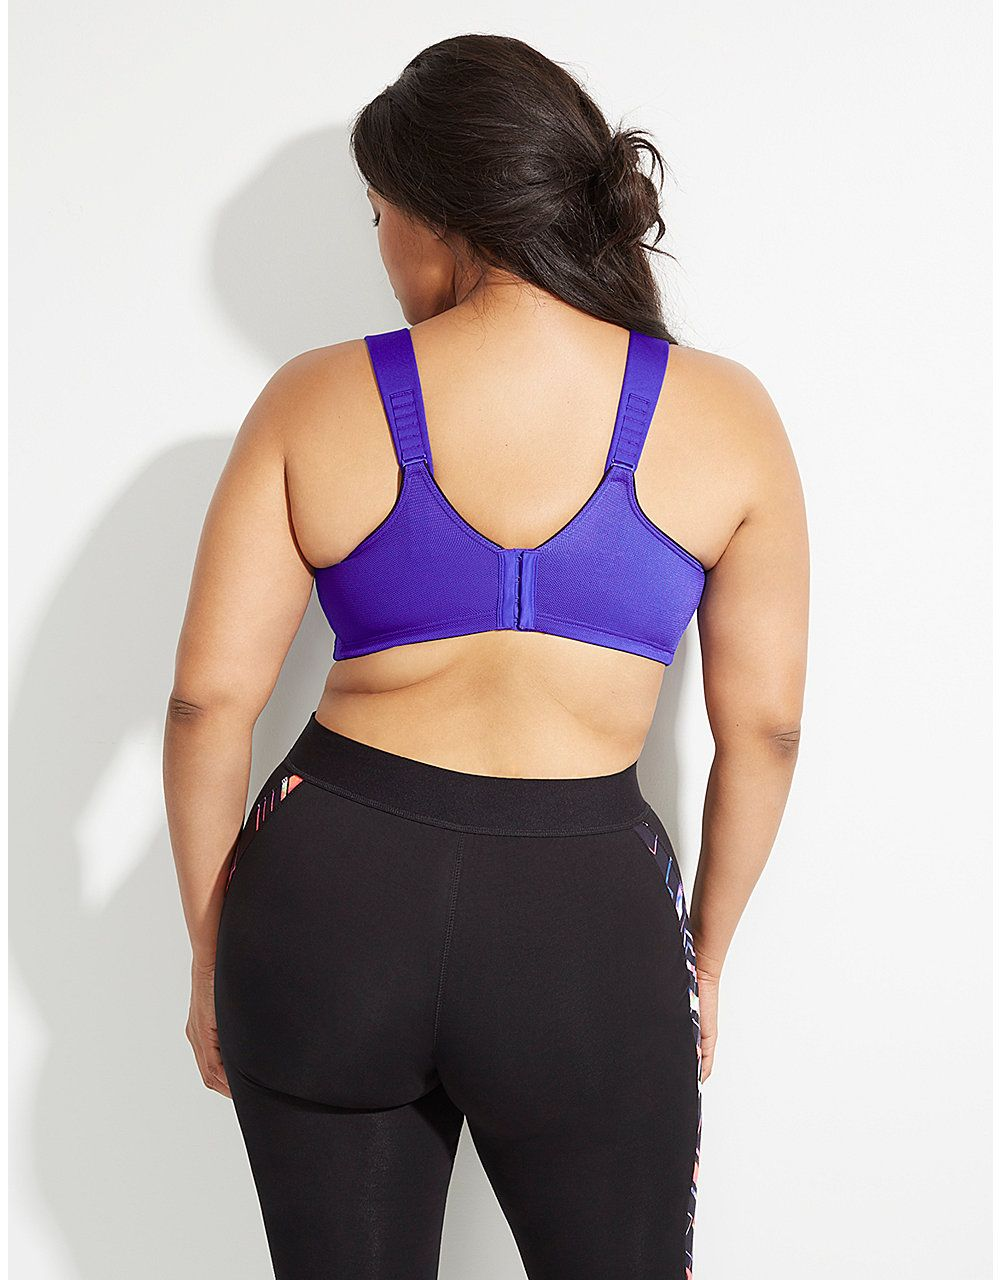 High impact sport bra by LIVI ACTIVE   Lane Bryant   clothing ideas ...